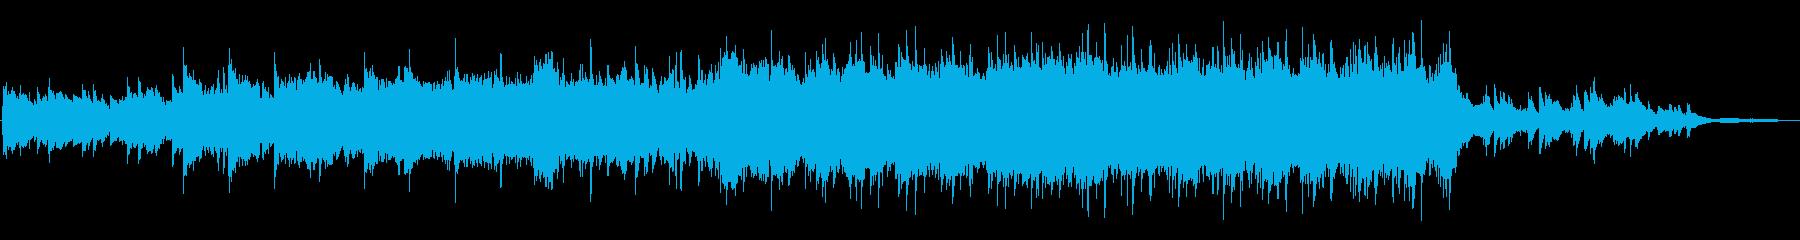 VP系7、ピアノ&オーケストラ、感動的Eの再生済みの波形